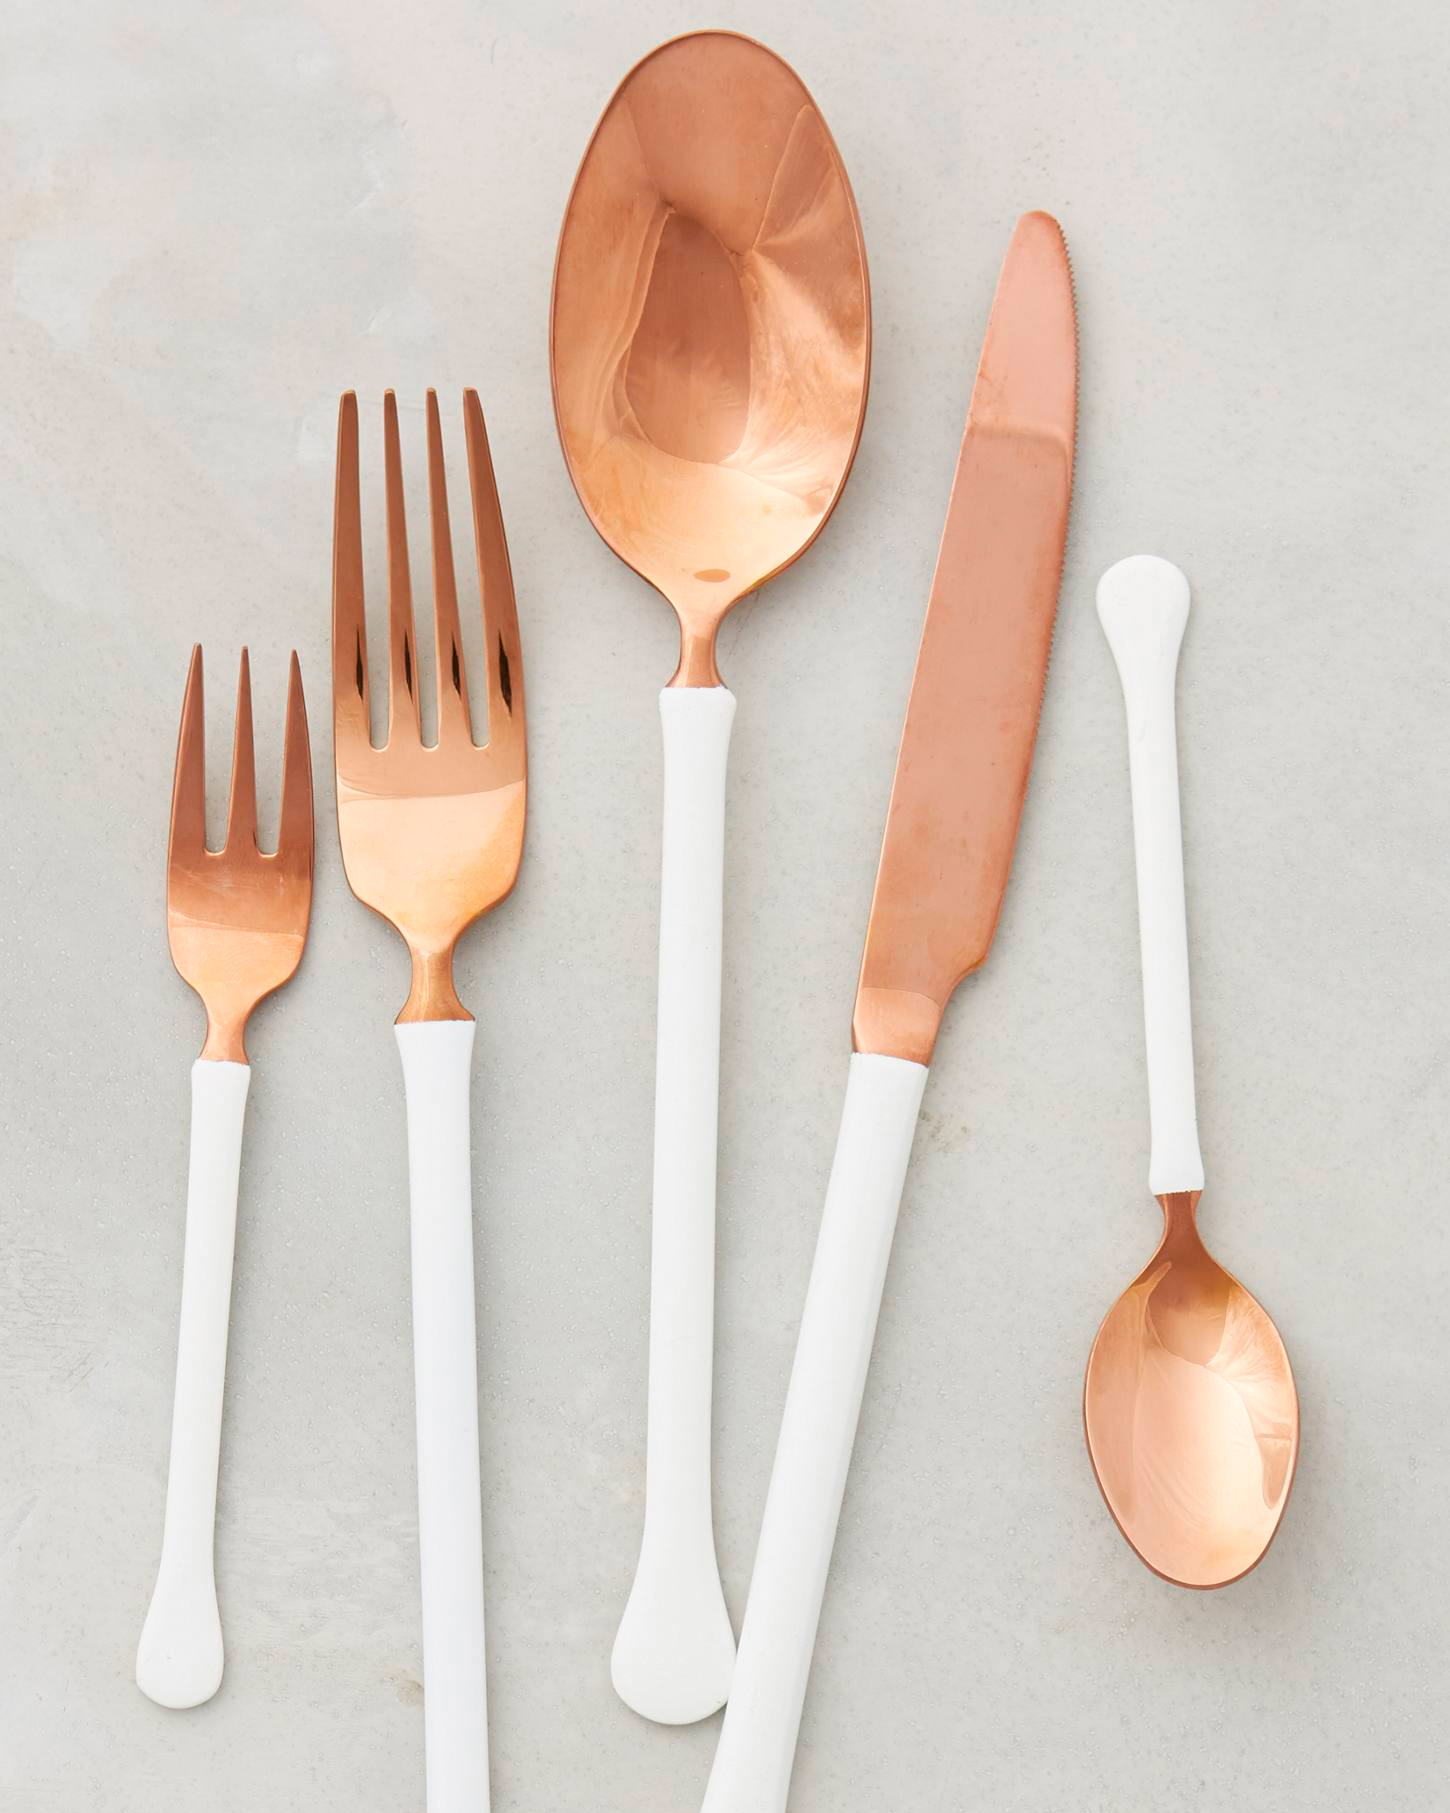 copper-registry-flatware-anthropologie-0116.jpg